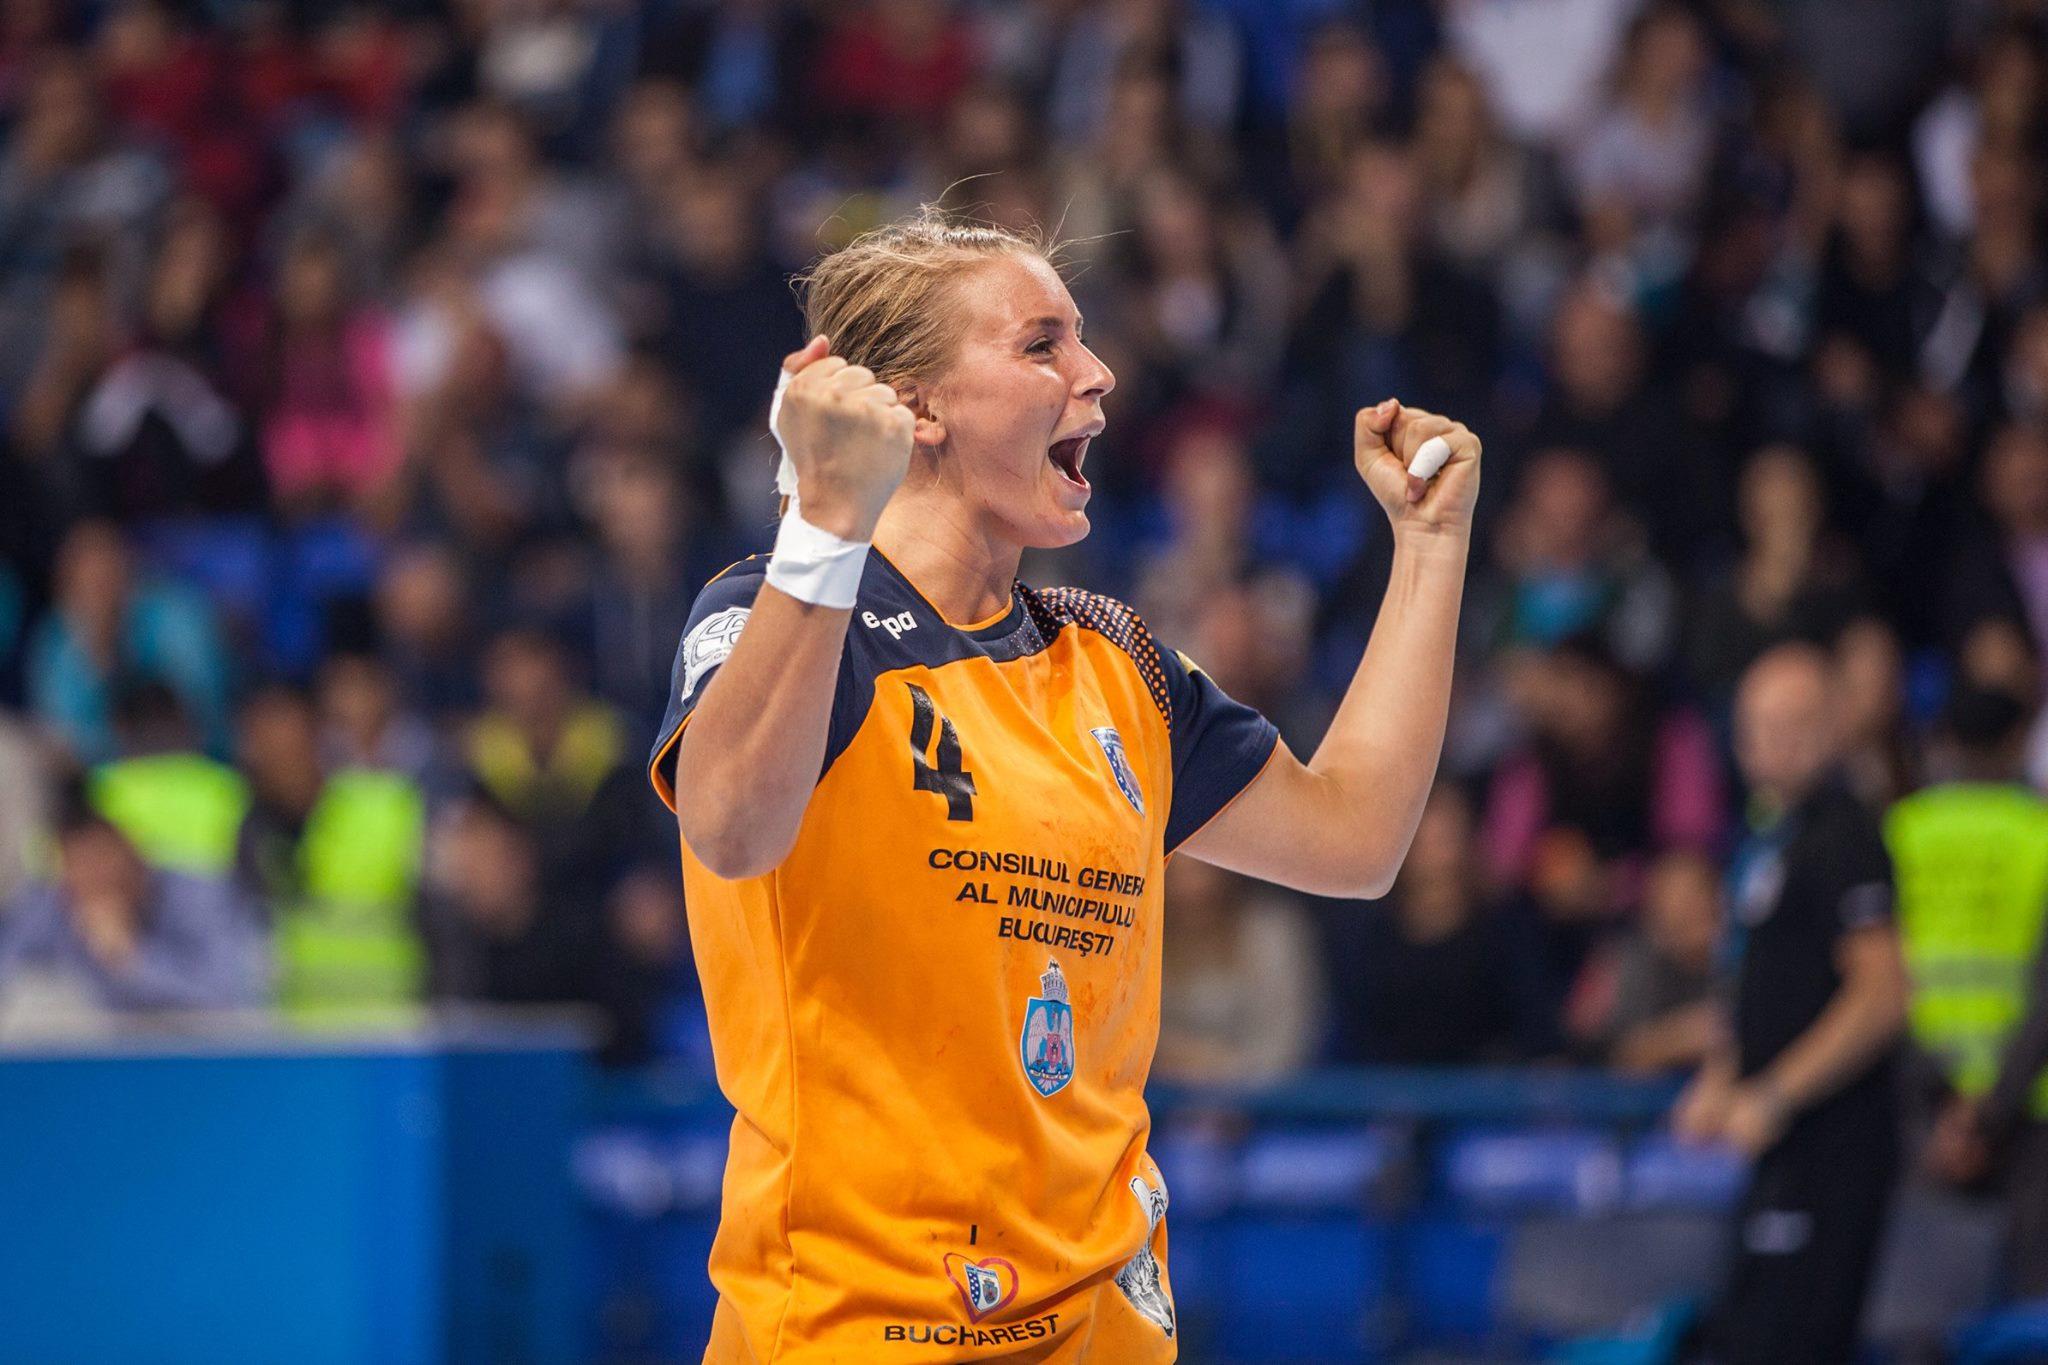 photo: EHF